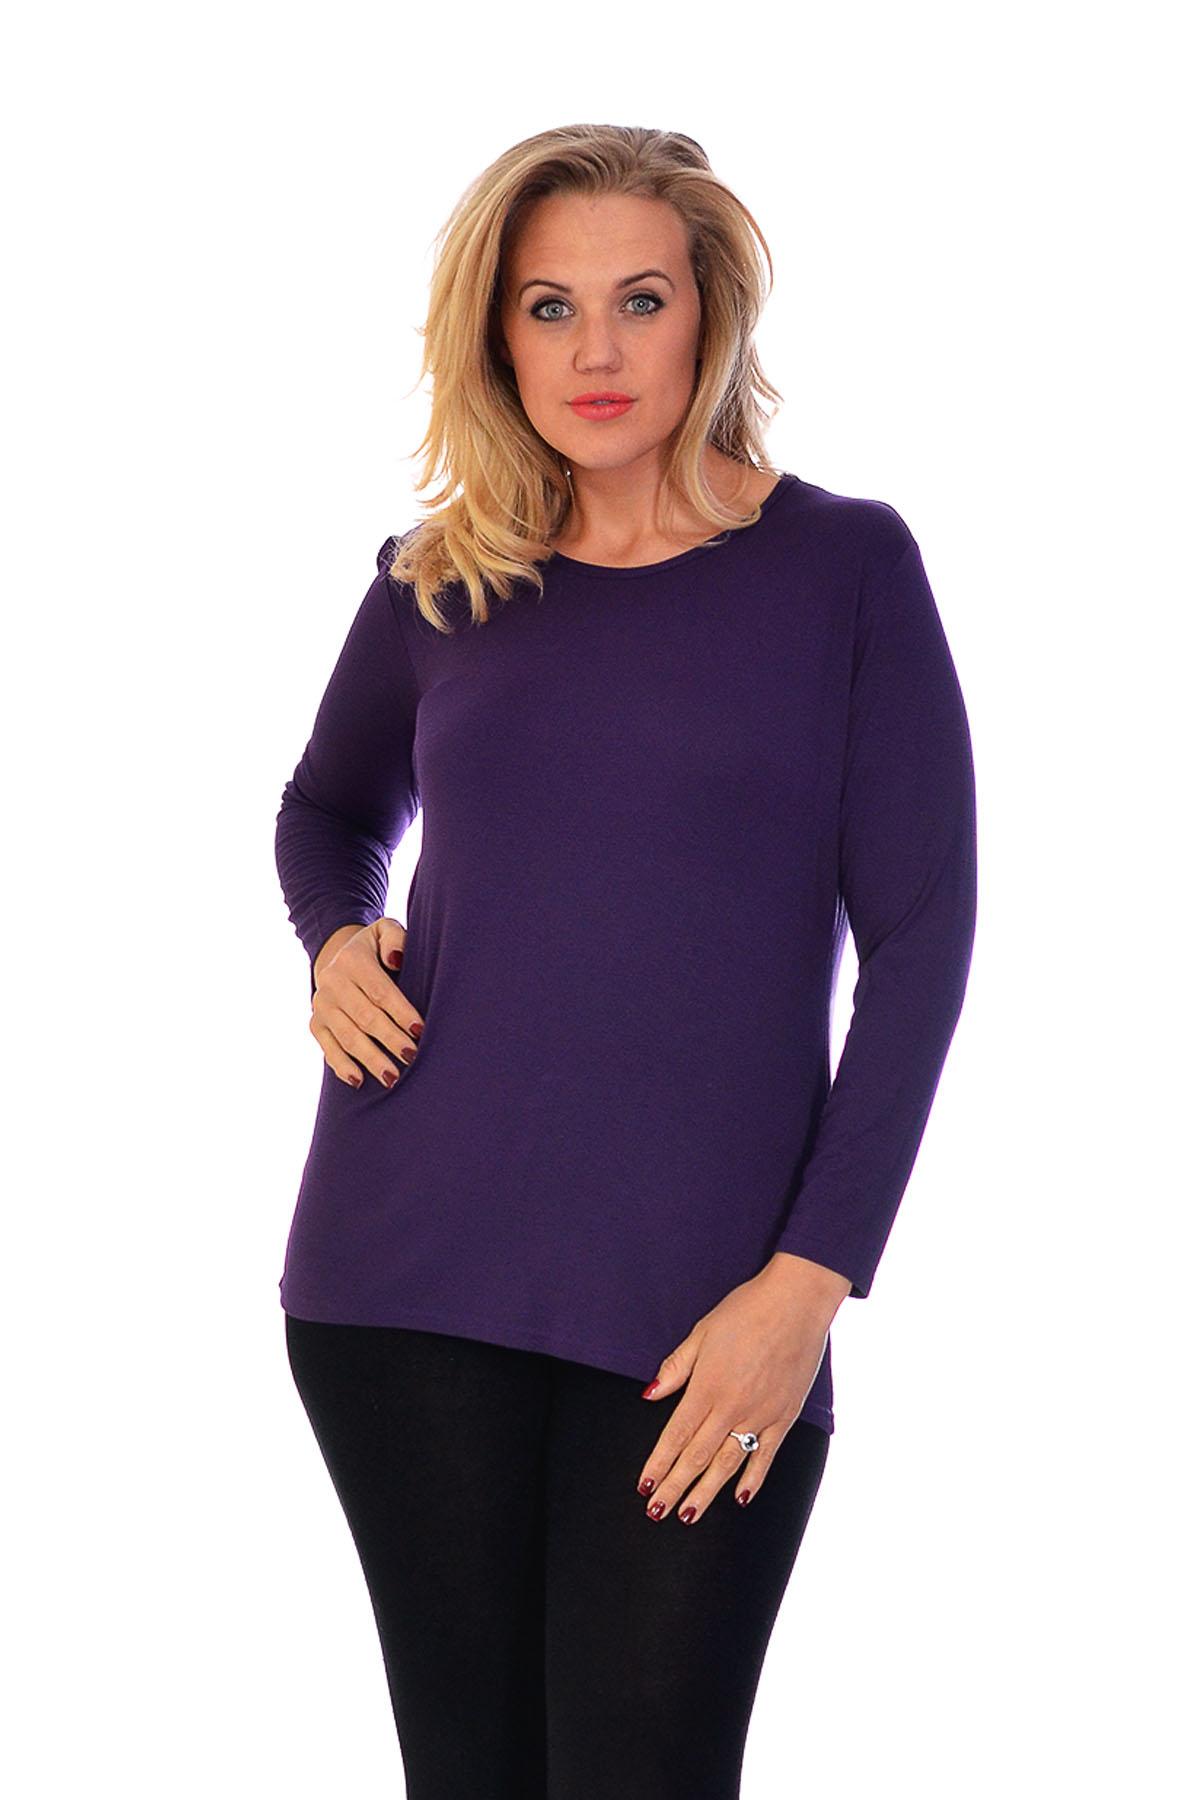 New Ladies T-Shirt Plus Size Womens Top Plain Long Sleeve ...